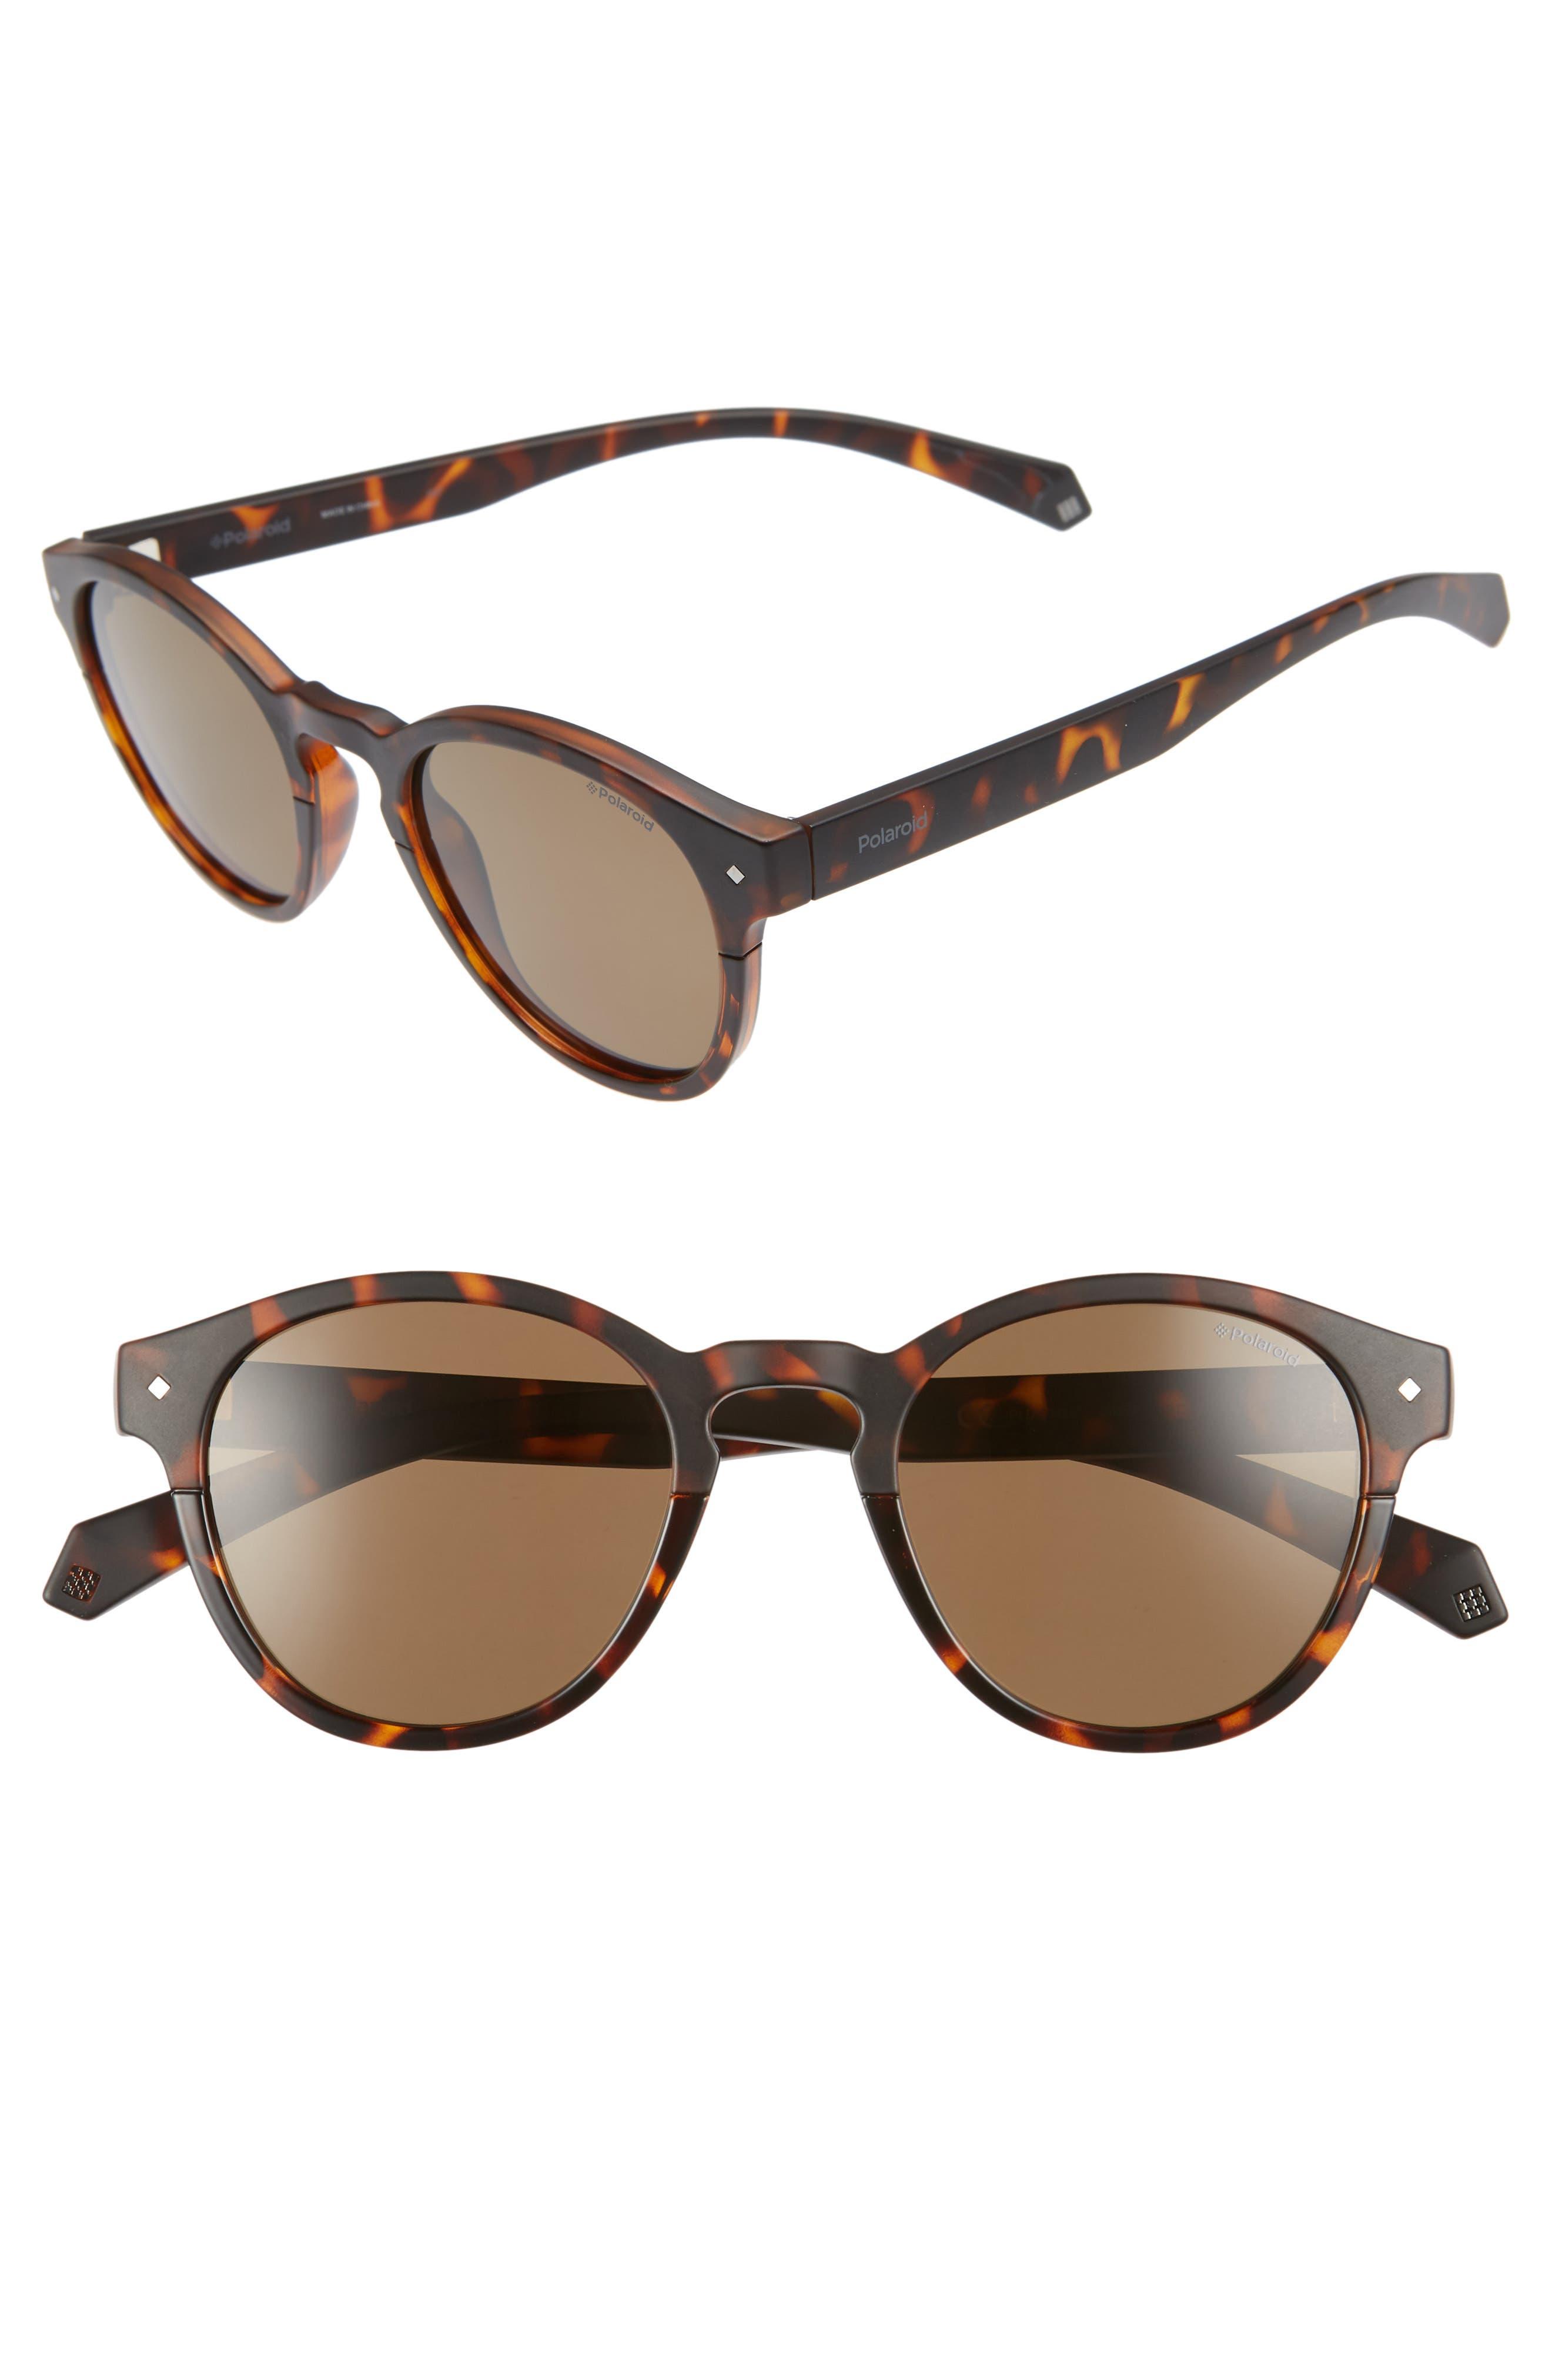 Polaroid 4m Polarized Round Sunglasses -